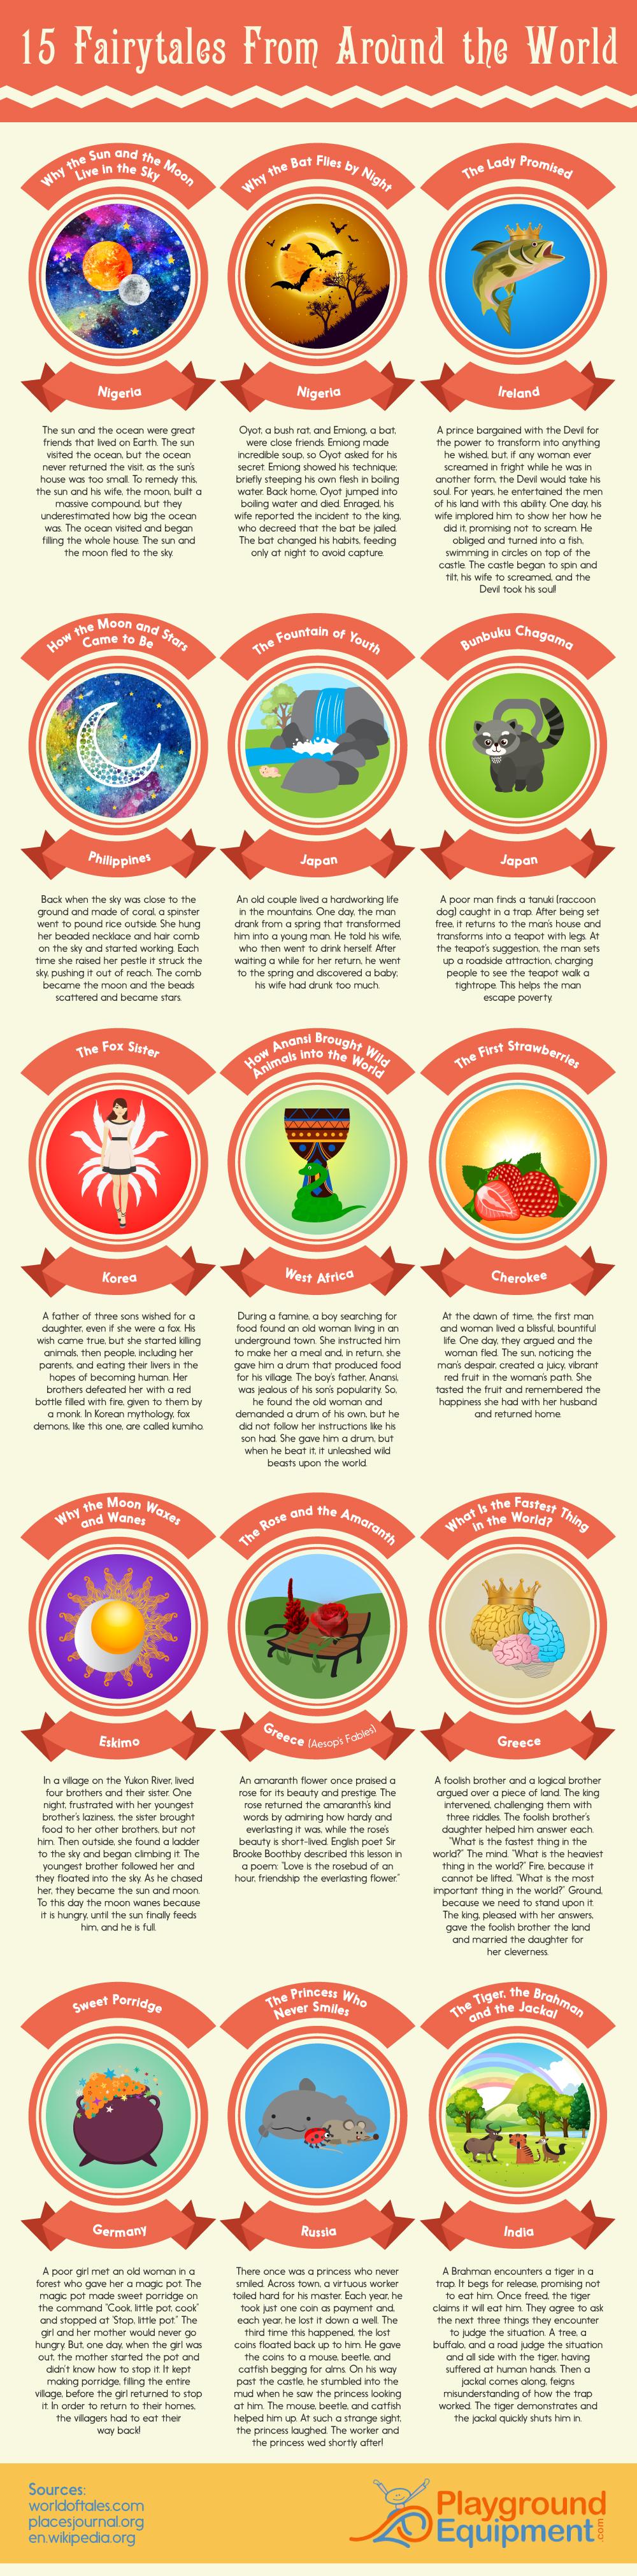 15 Fairytales From Around the World - PlaygroundEquipment.com - Infographic